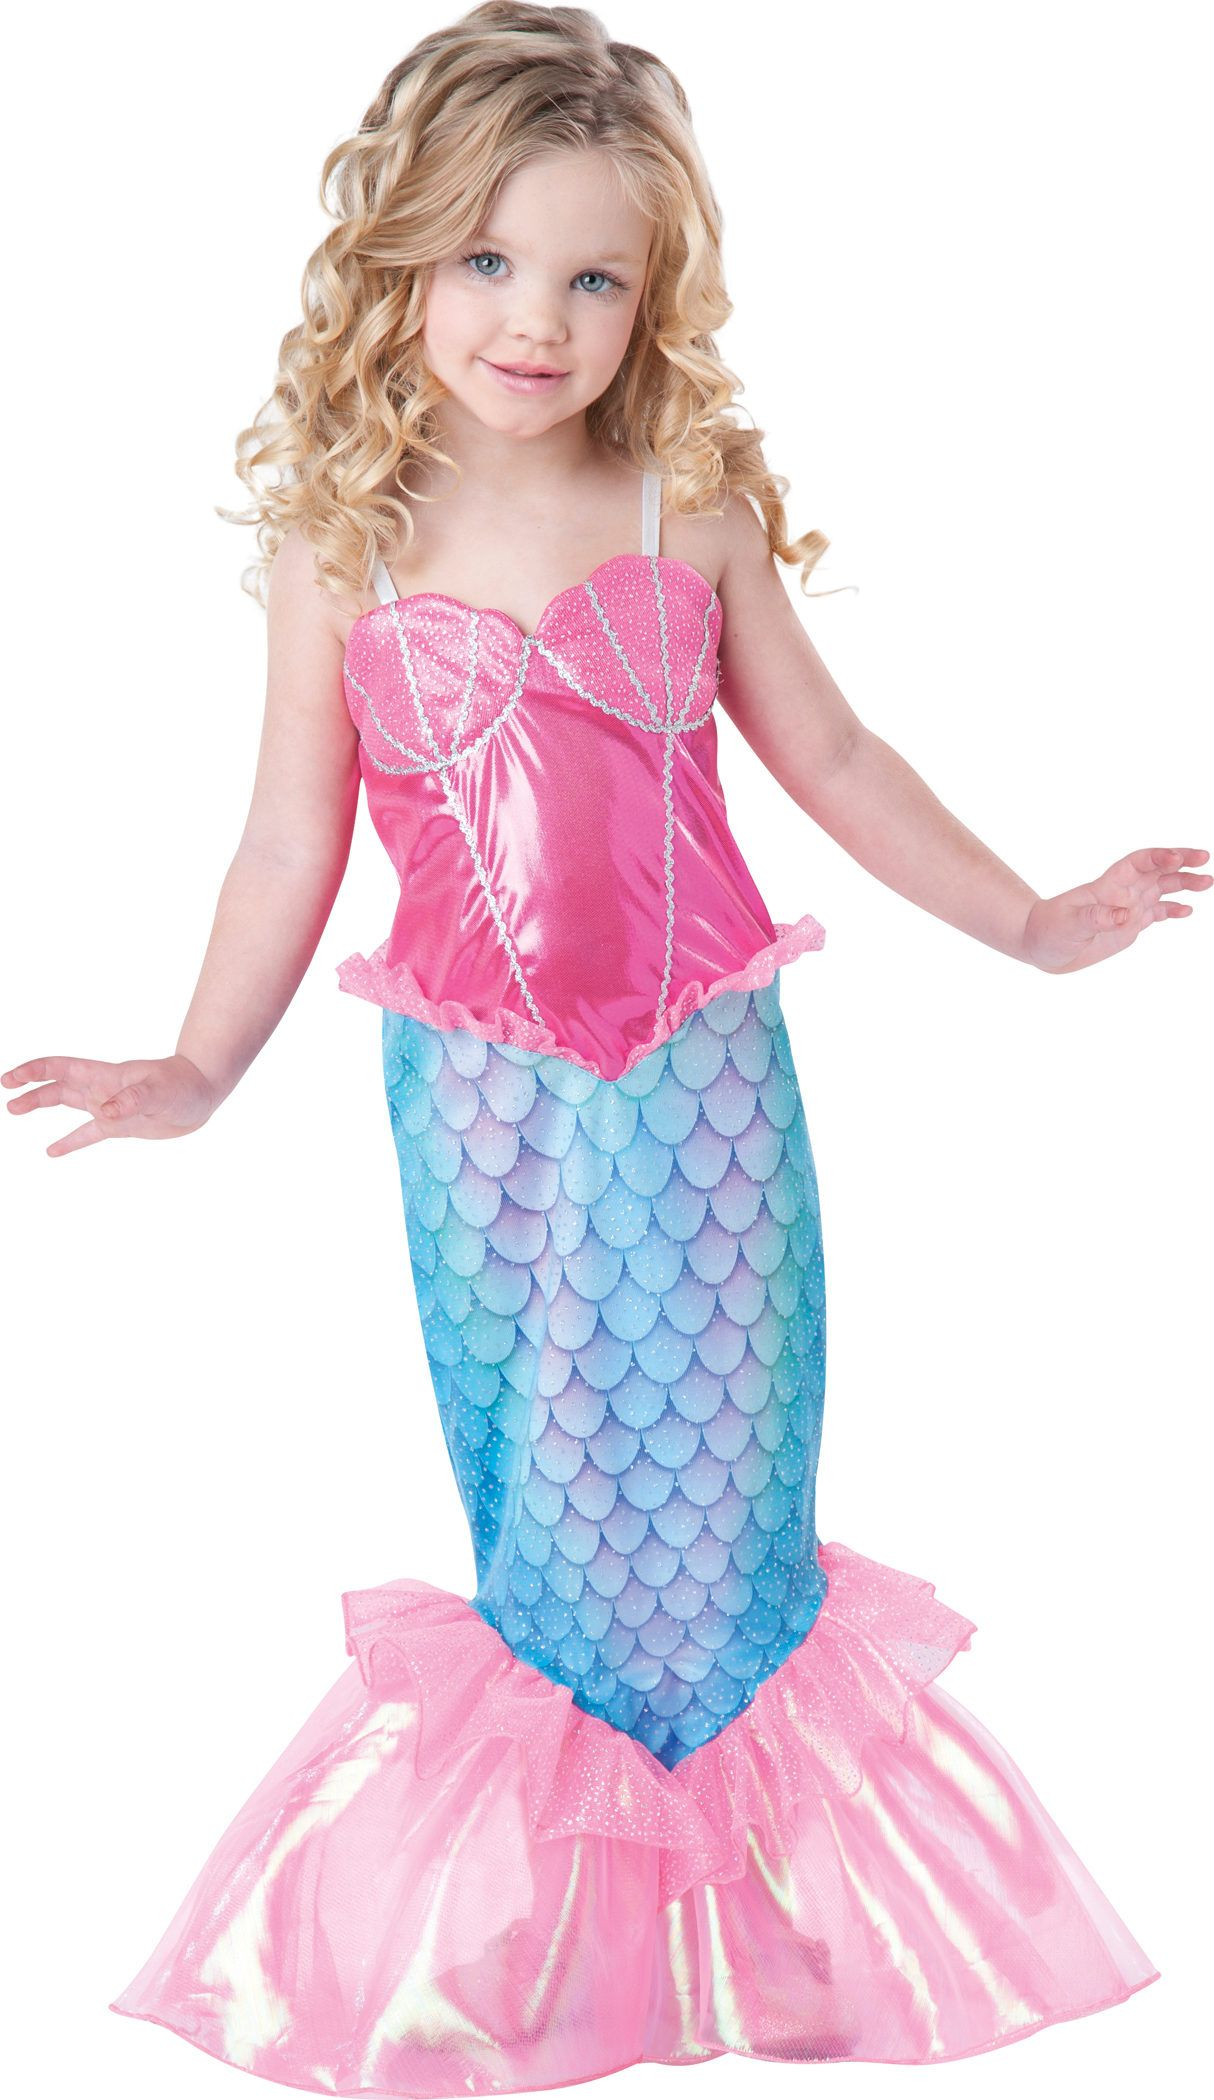 Mystical Mermaid Kids Costume - Mr. Costumes | Halloween~ Costumes ...